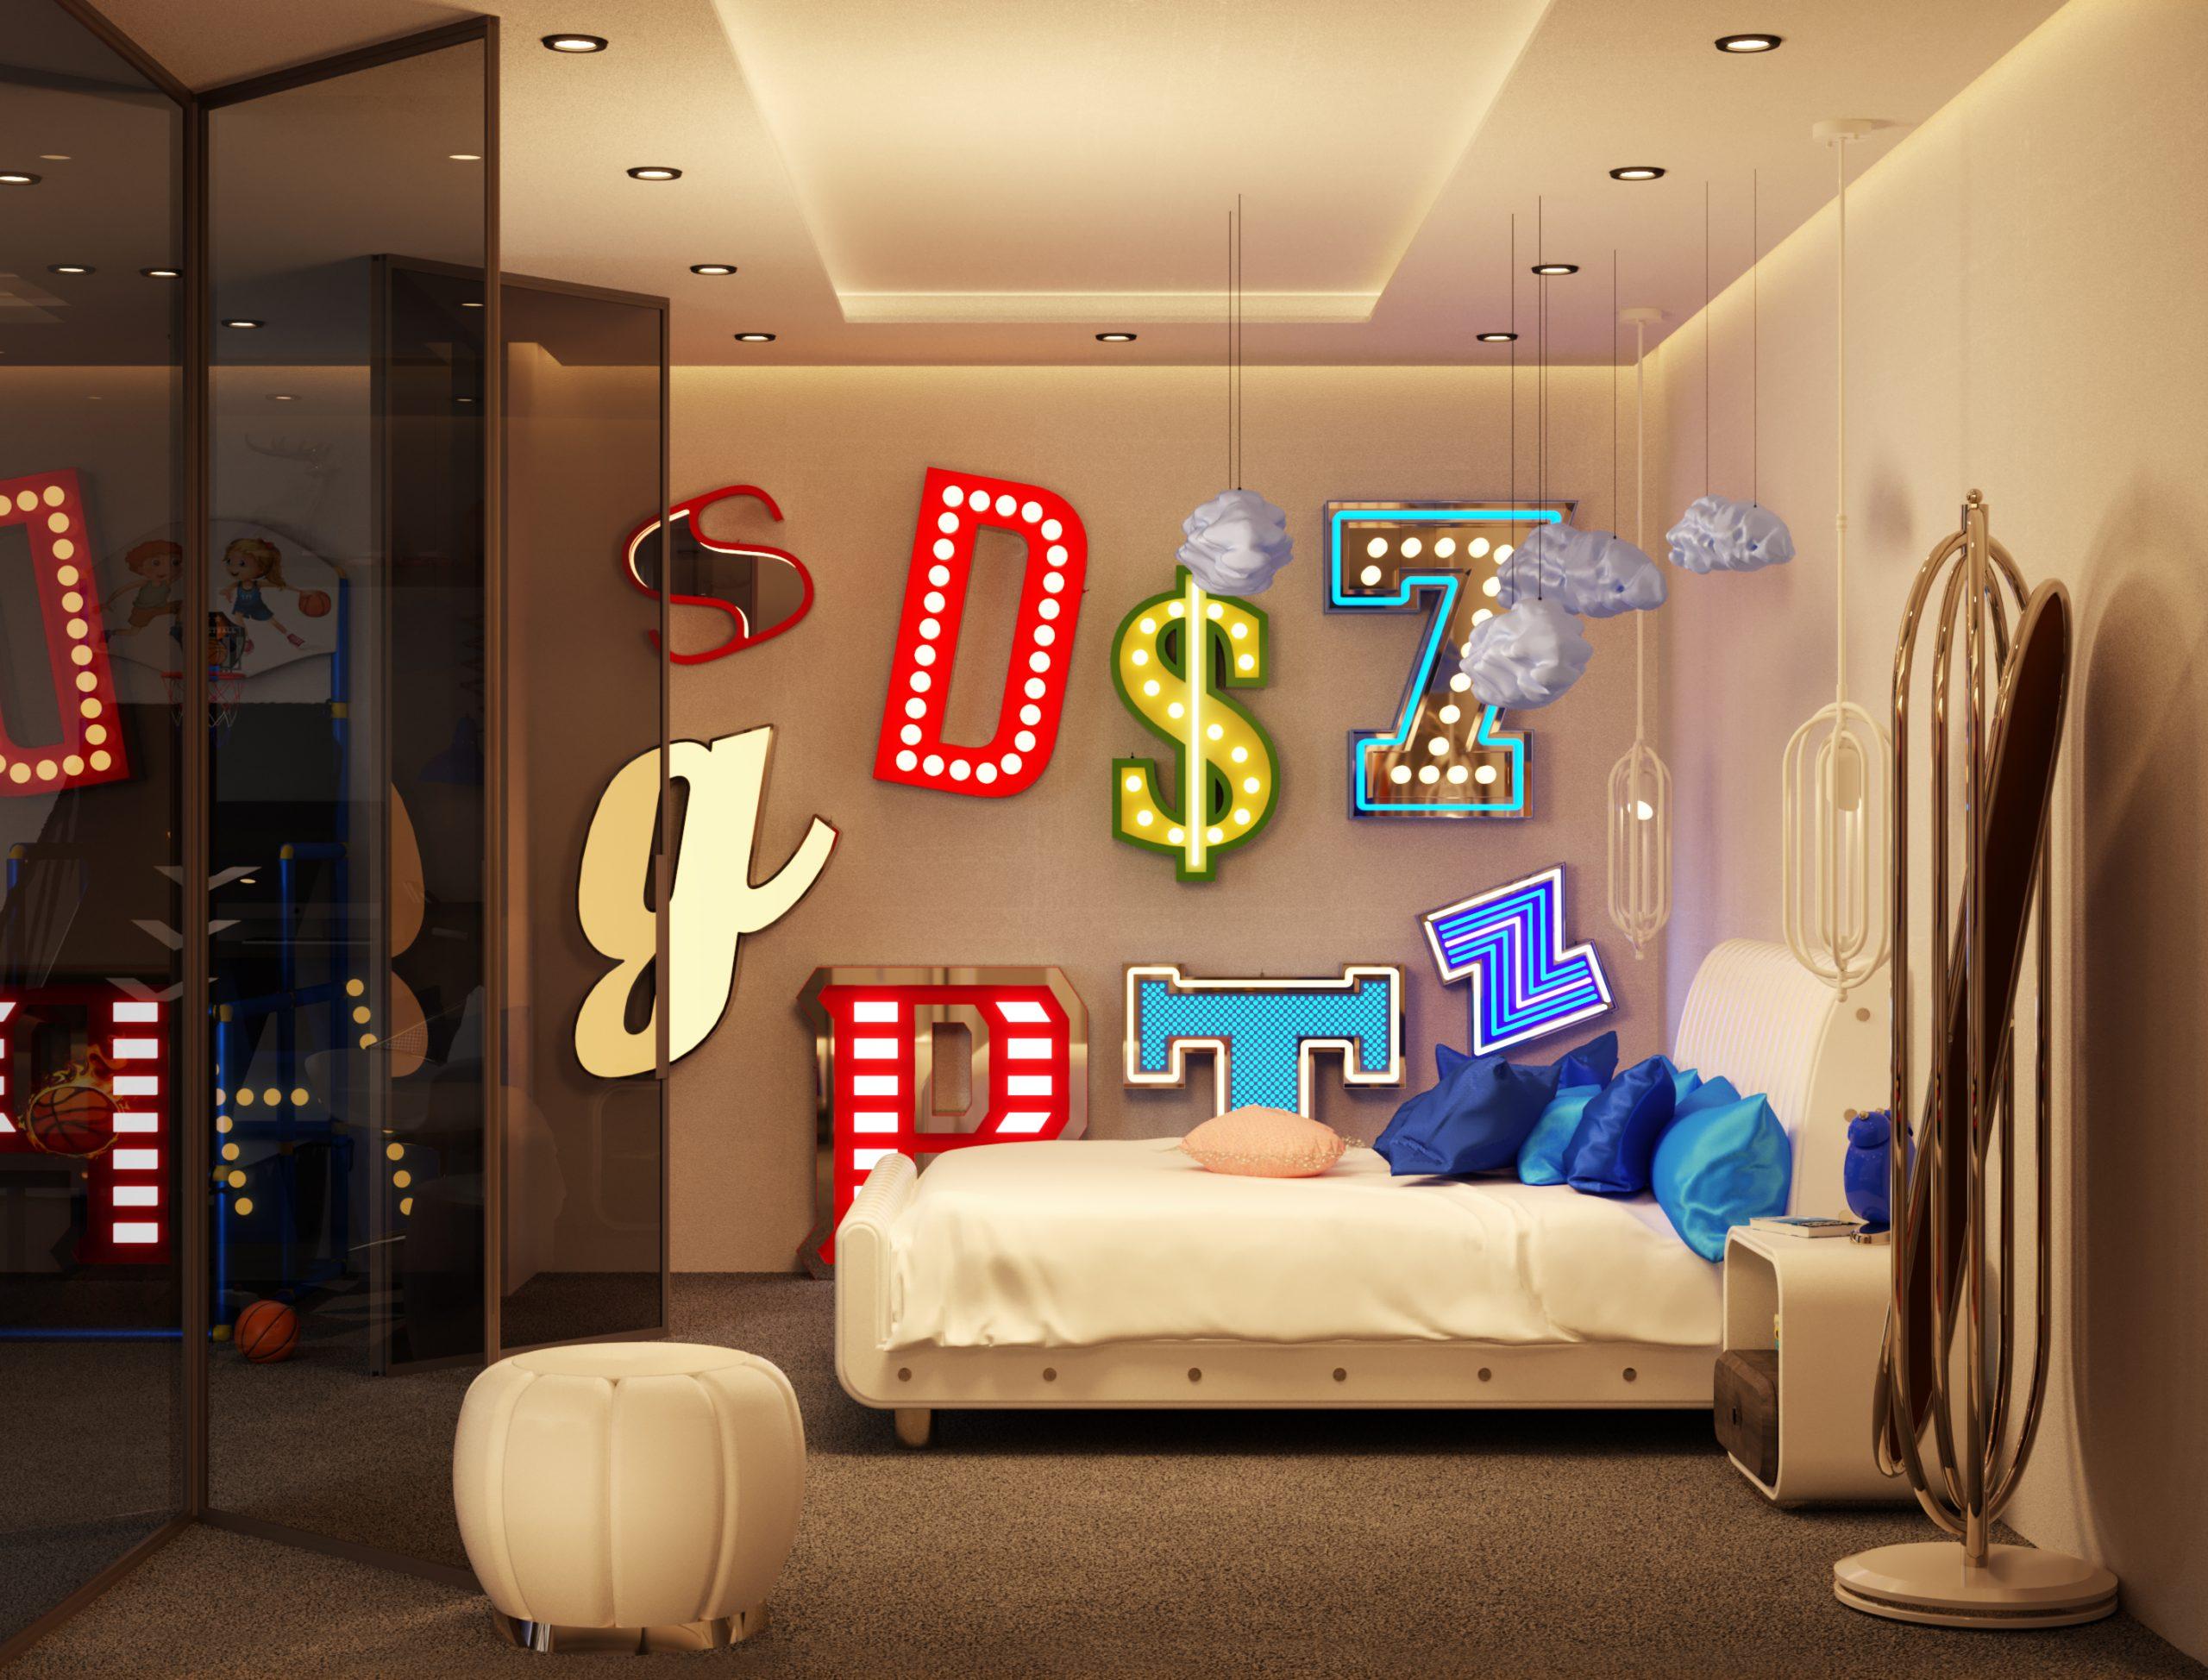 Fun Bedroom Makeover Ideas!